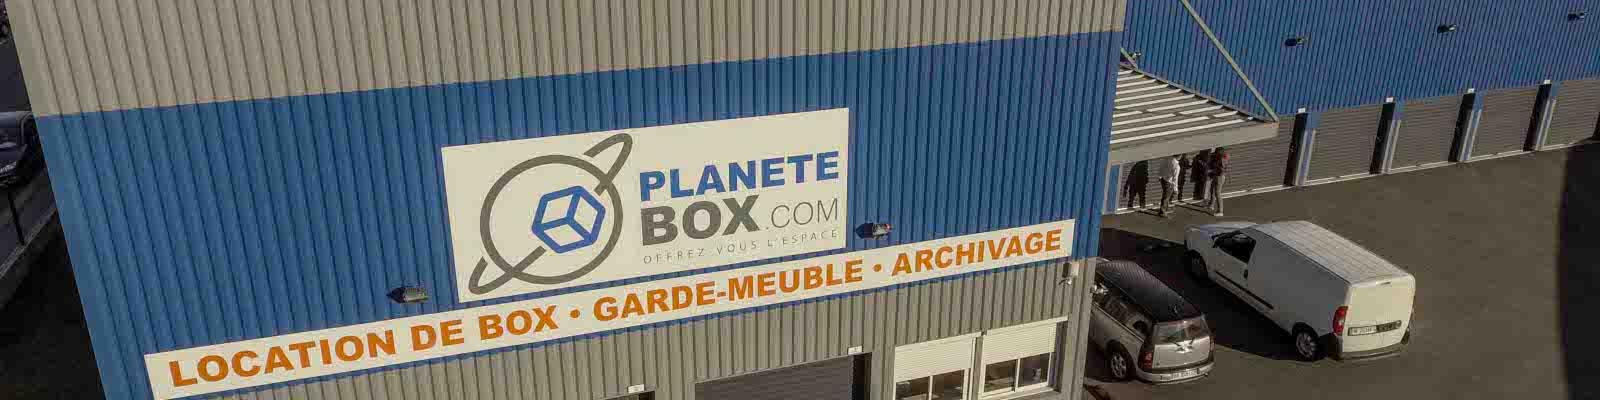 location box pas cher toulouse self